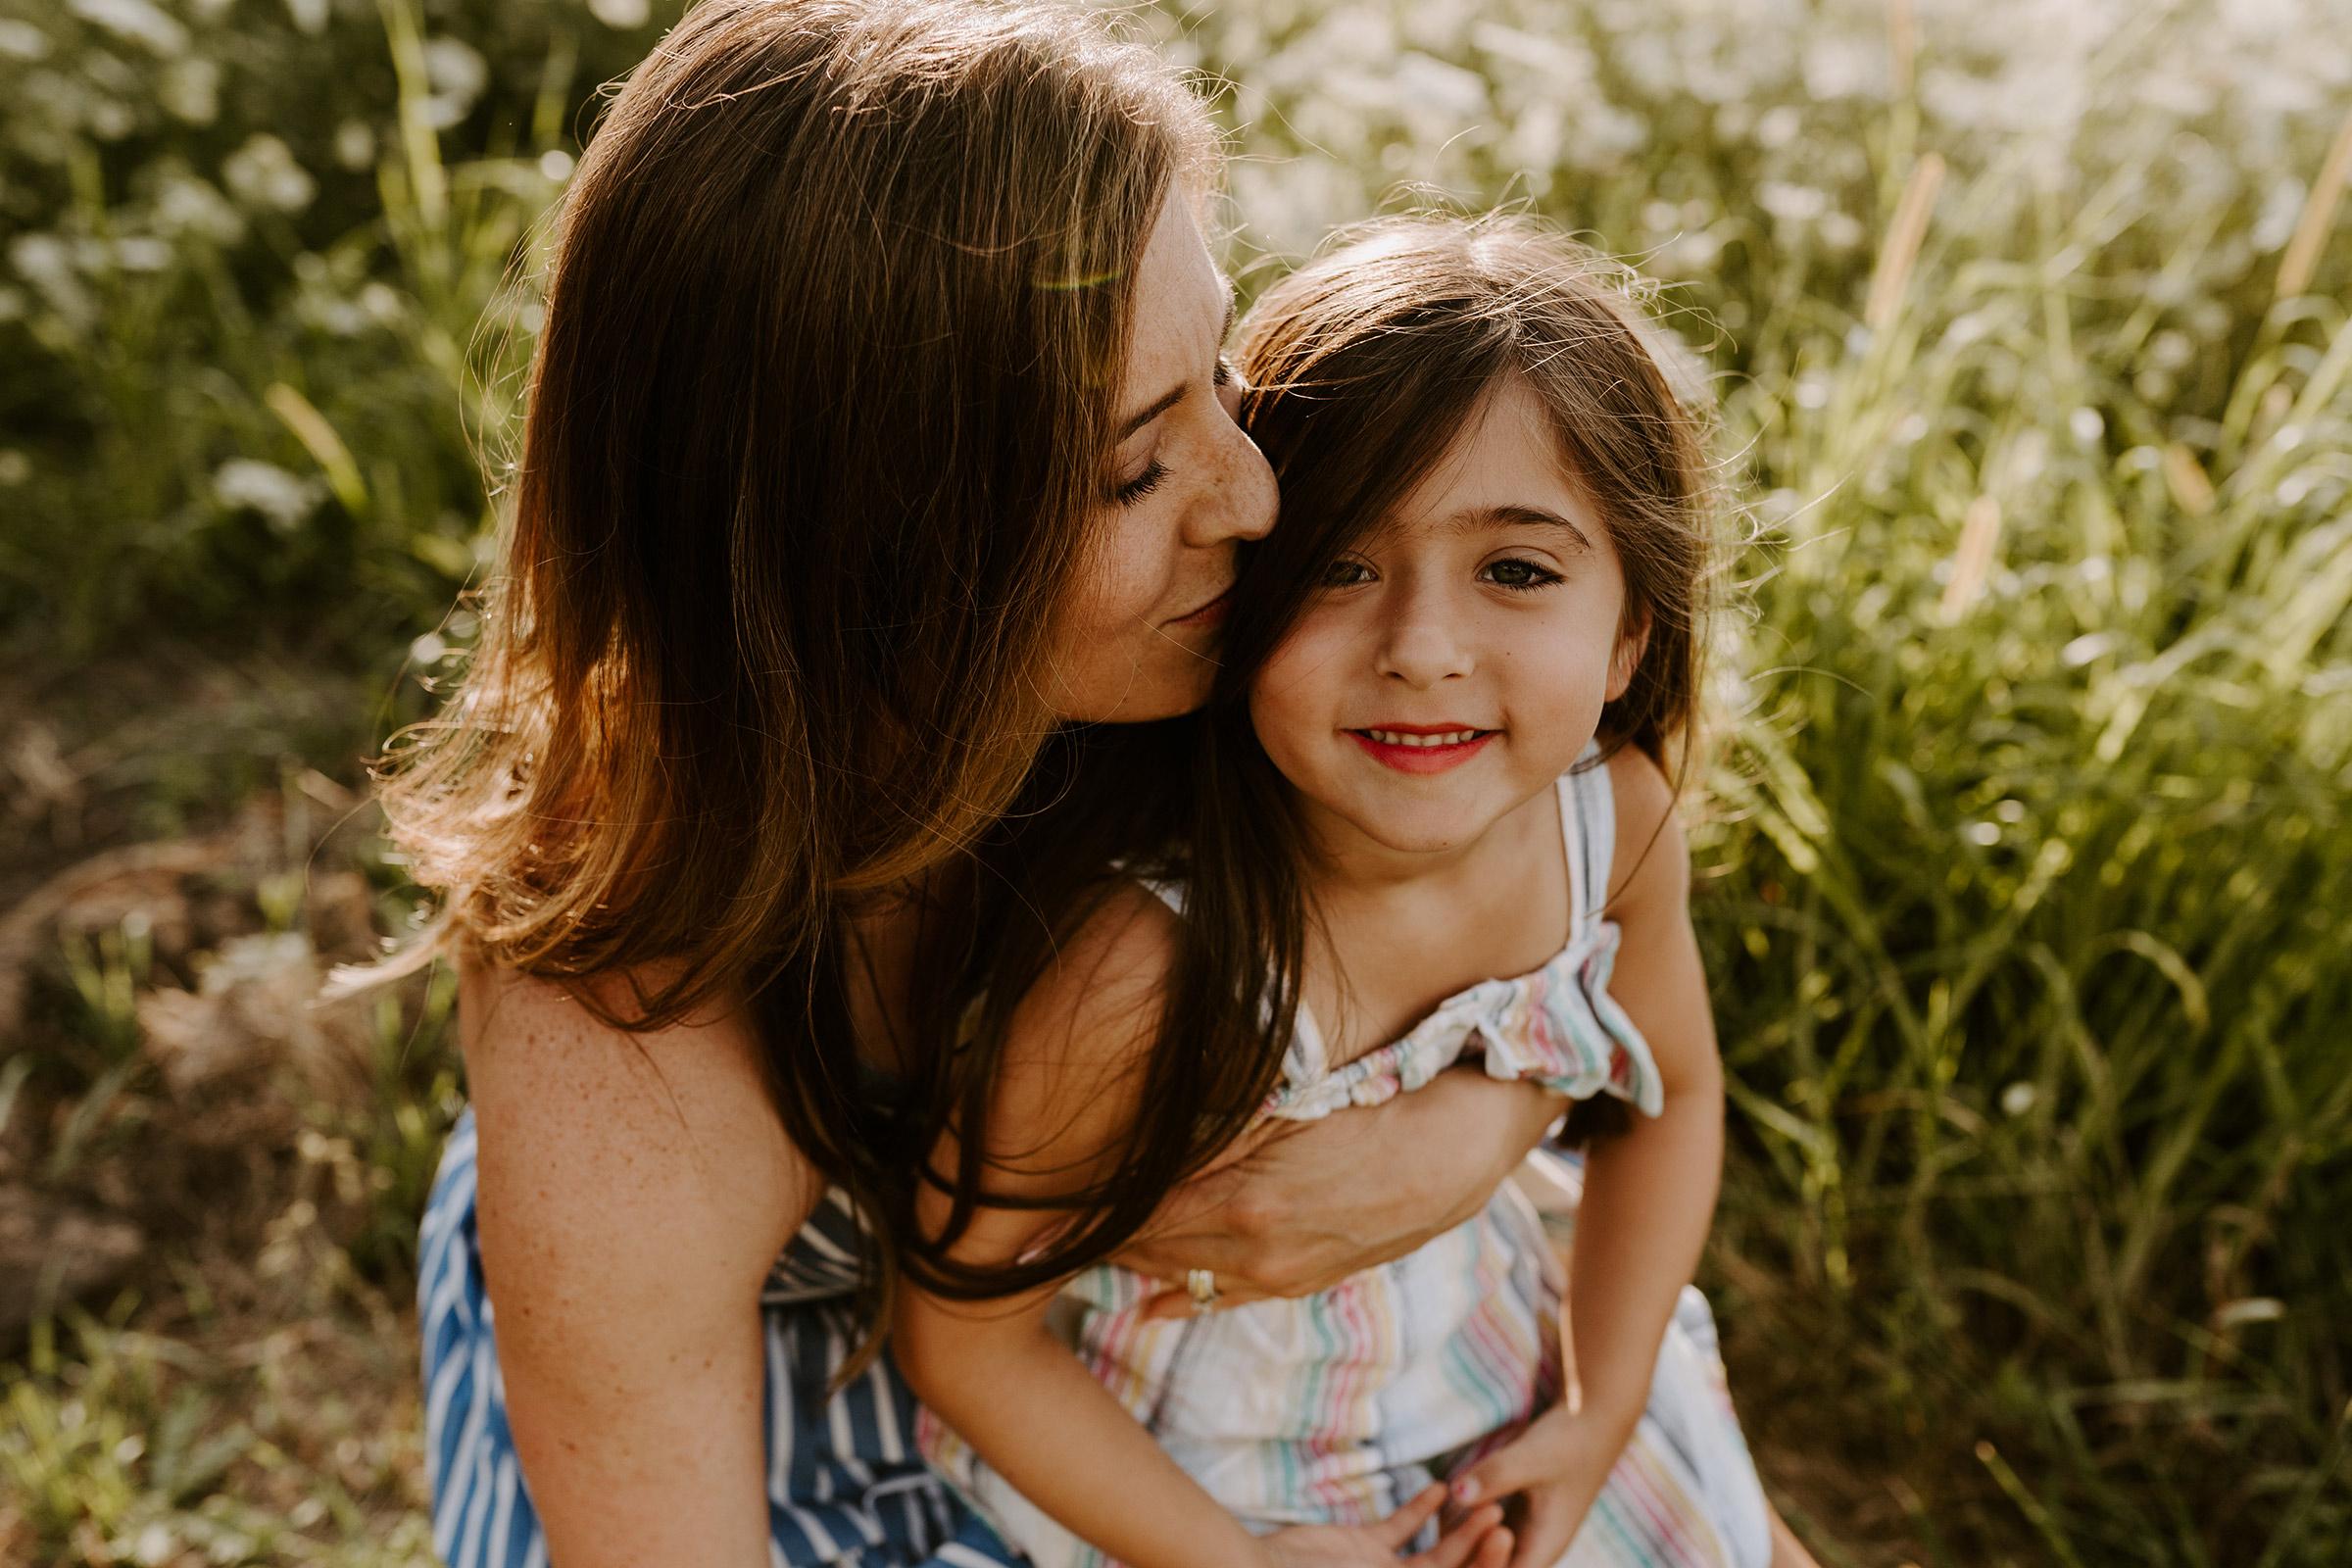 natale-family-mom-hugging-daughter-while-smiling-iris-aisle--winterset-iowa-raelyn-ramey-photography-29.jpg